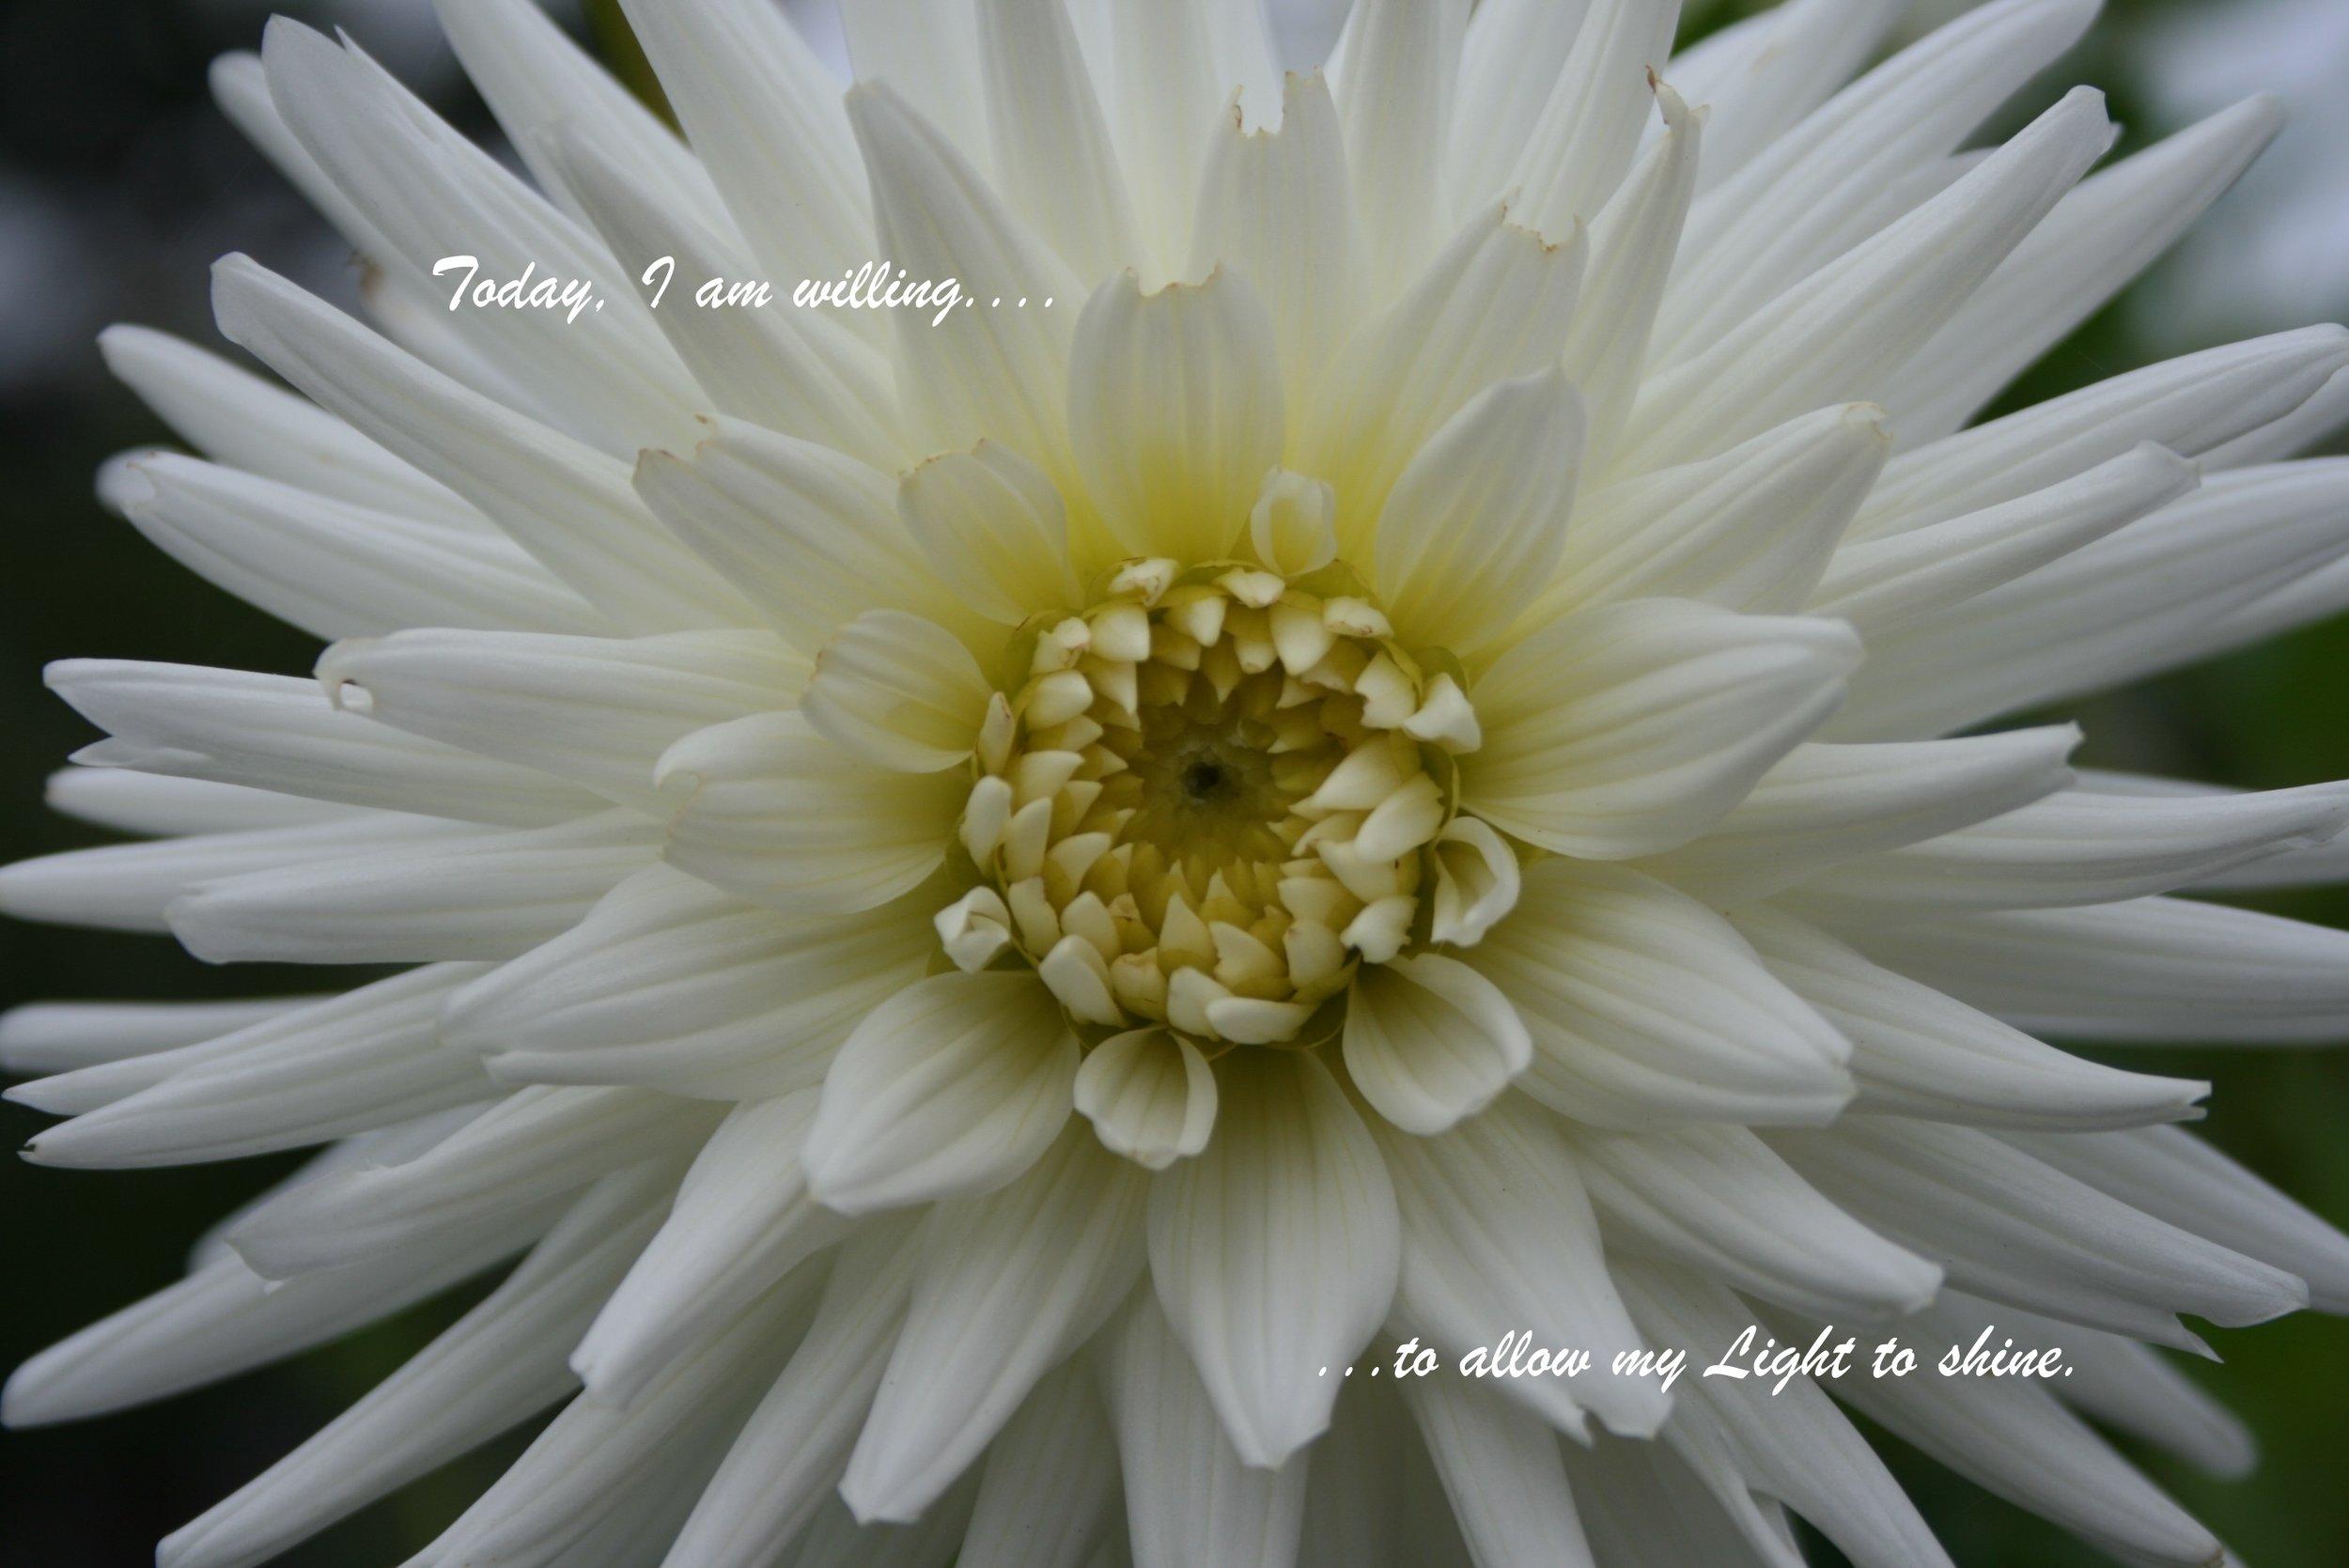 Dahlia_allow my light to shine.jpg